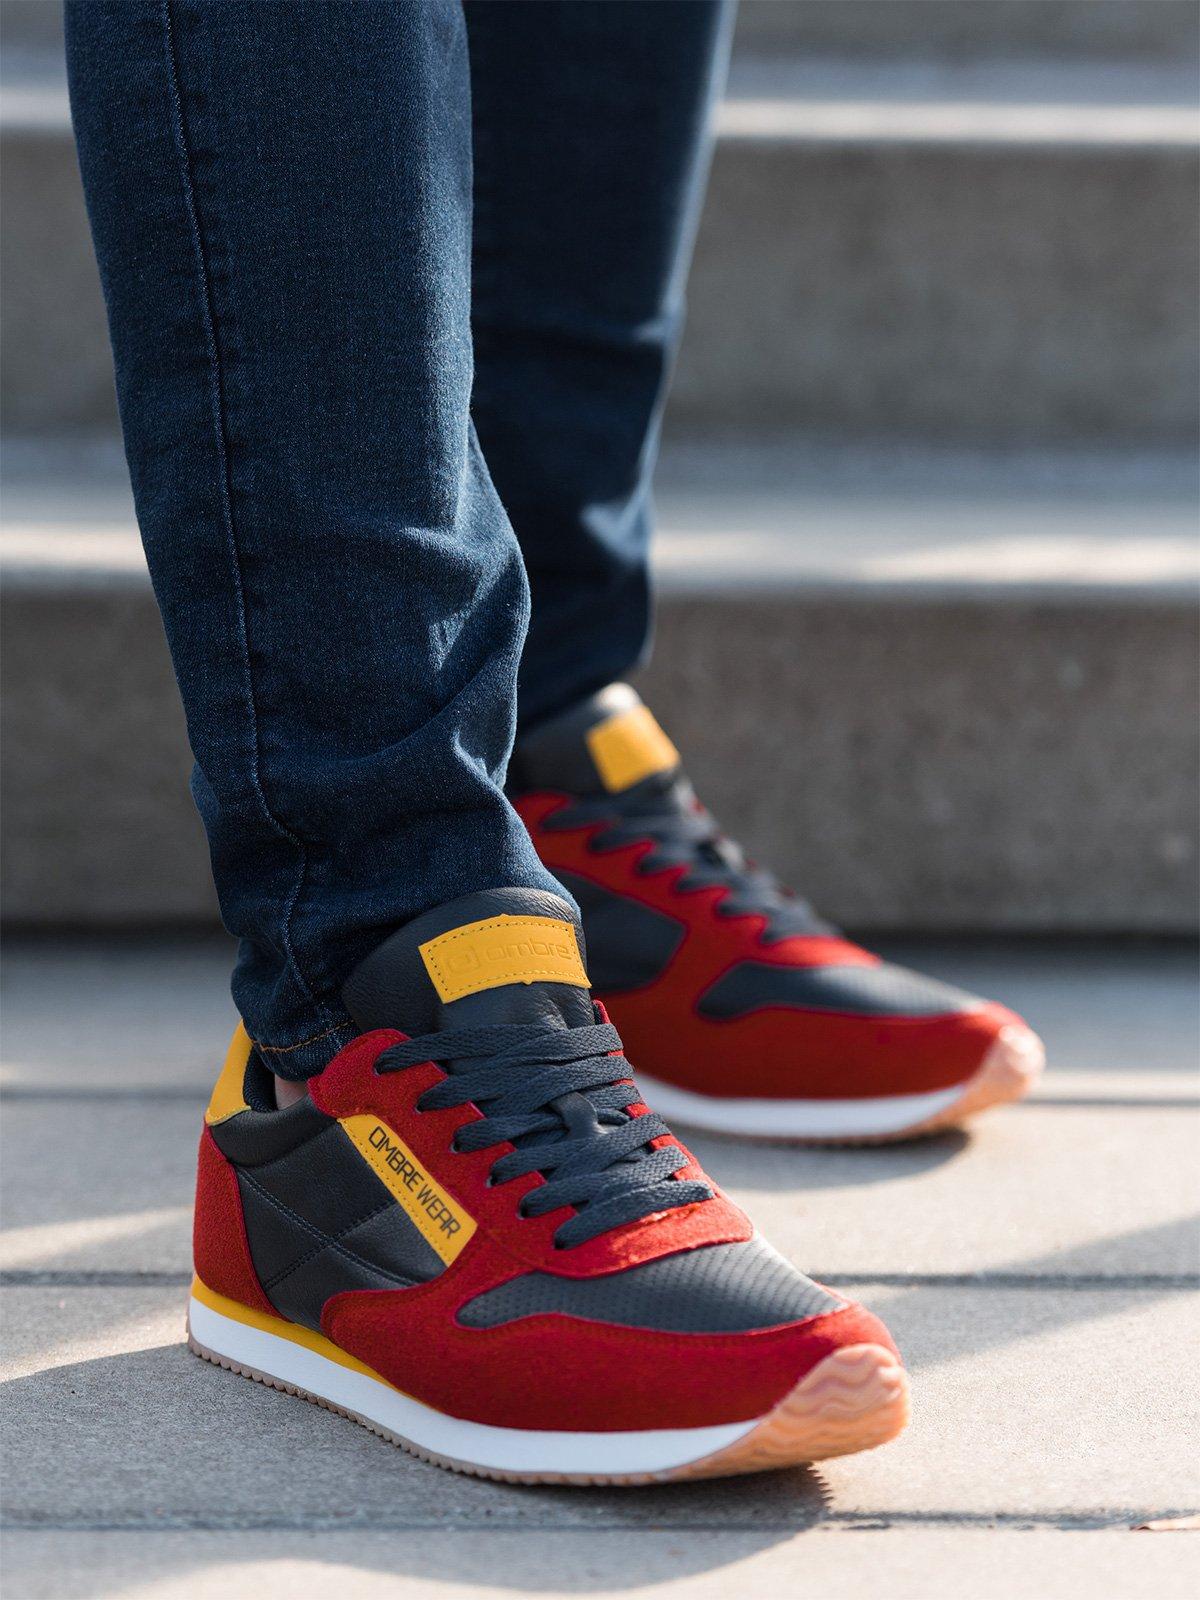 Buty Meskie Sneakersy T310 Czerwone Sklep Ombre Pl